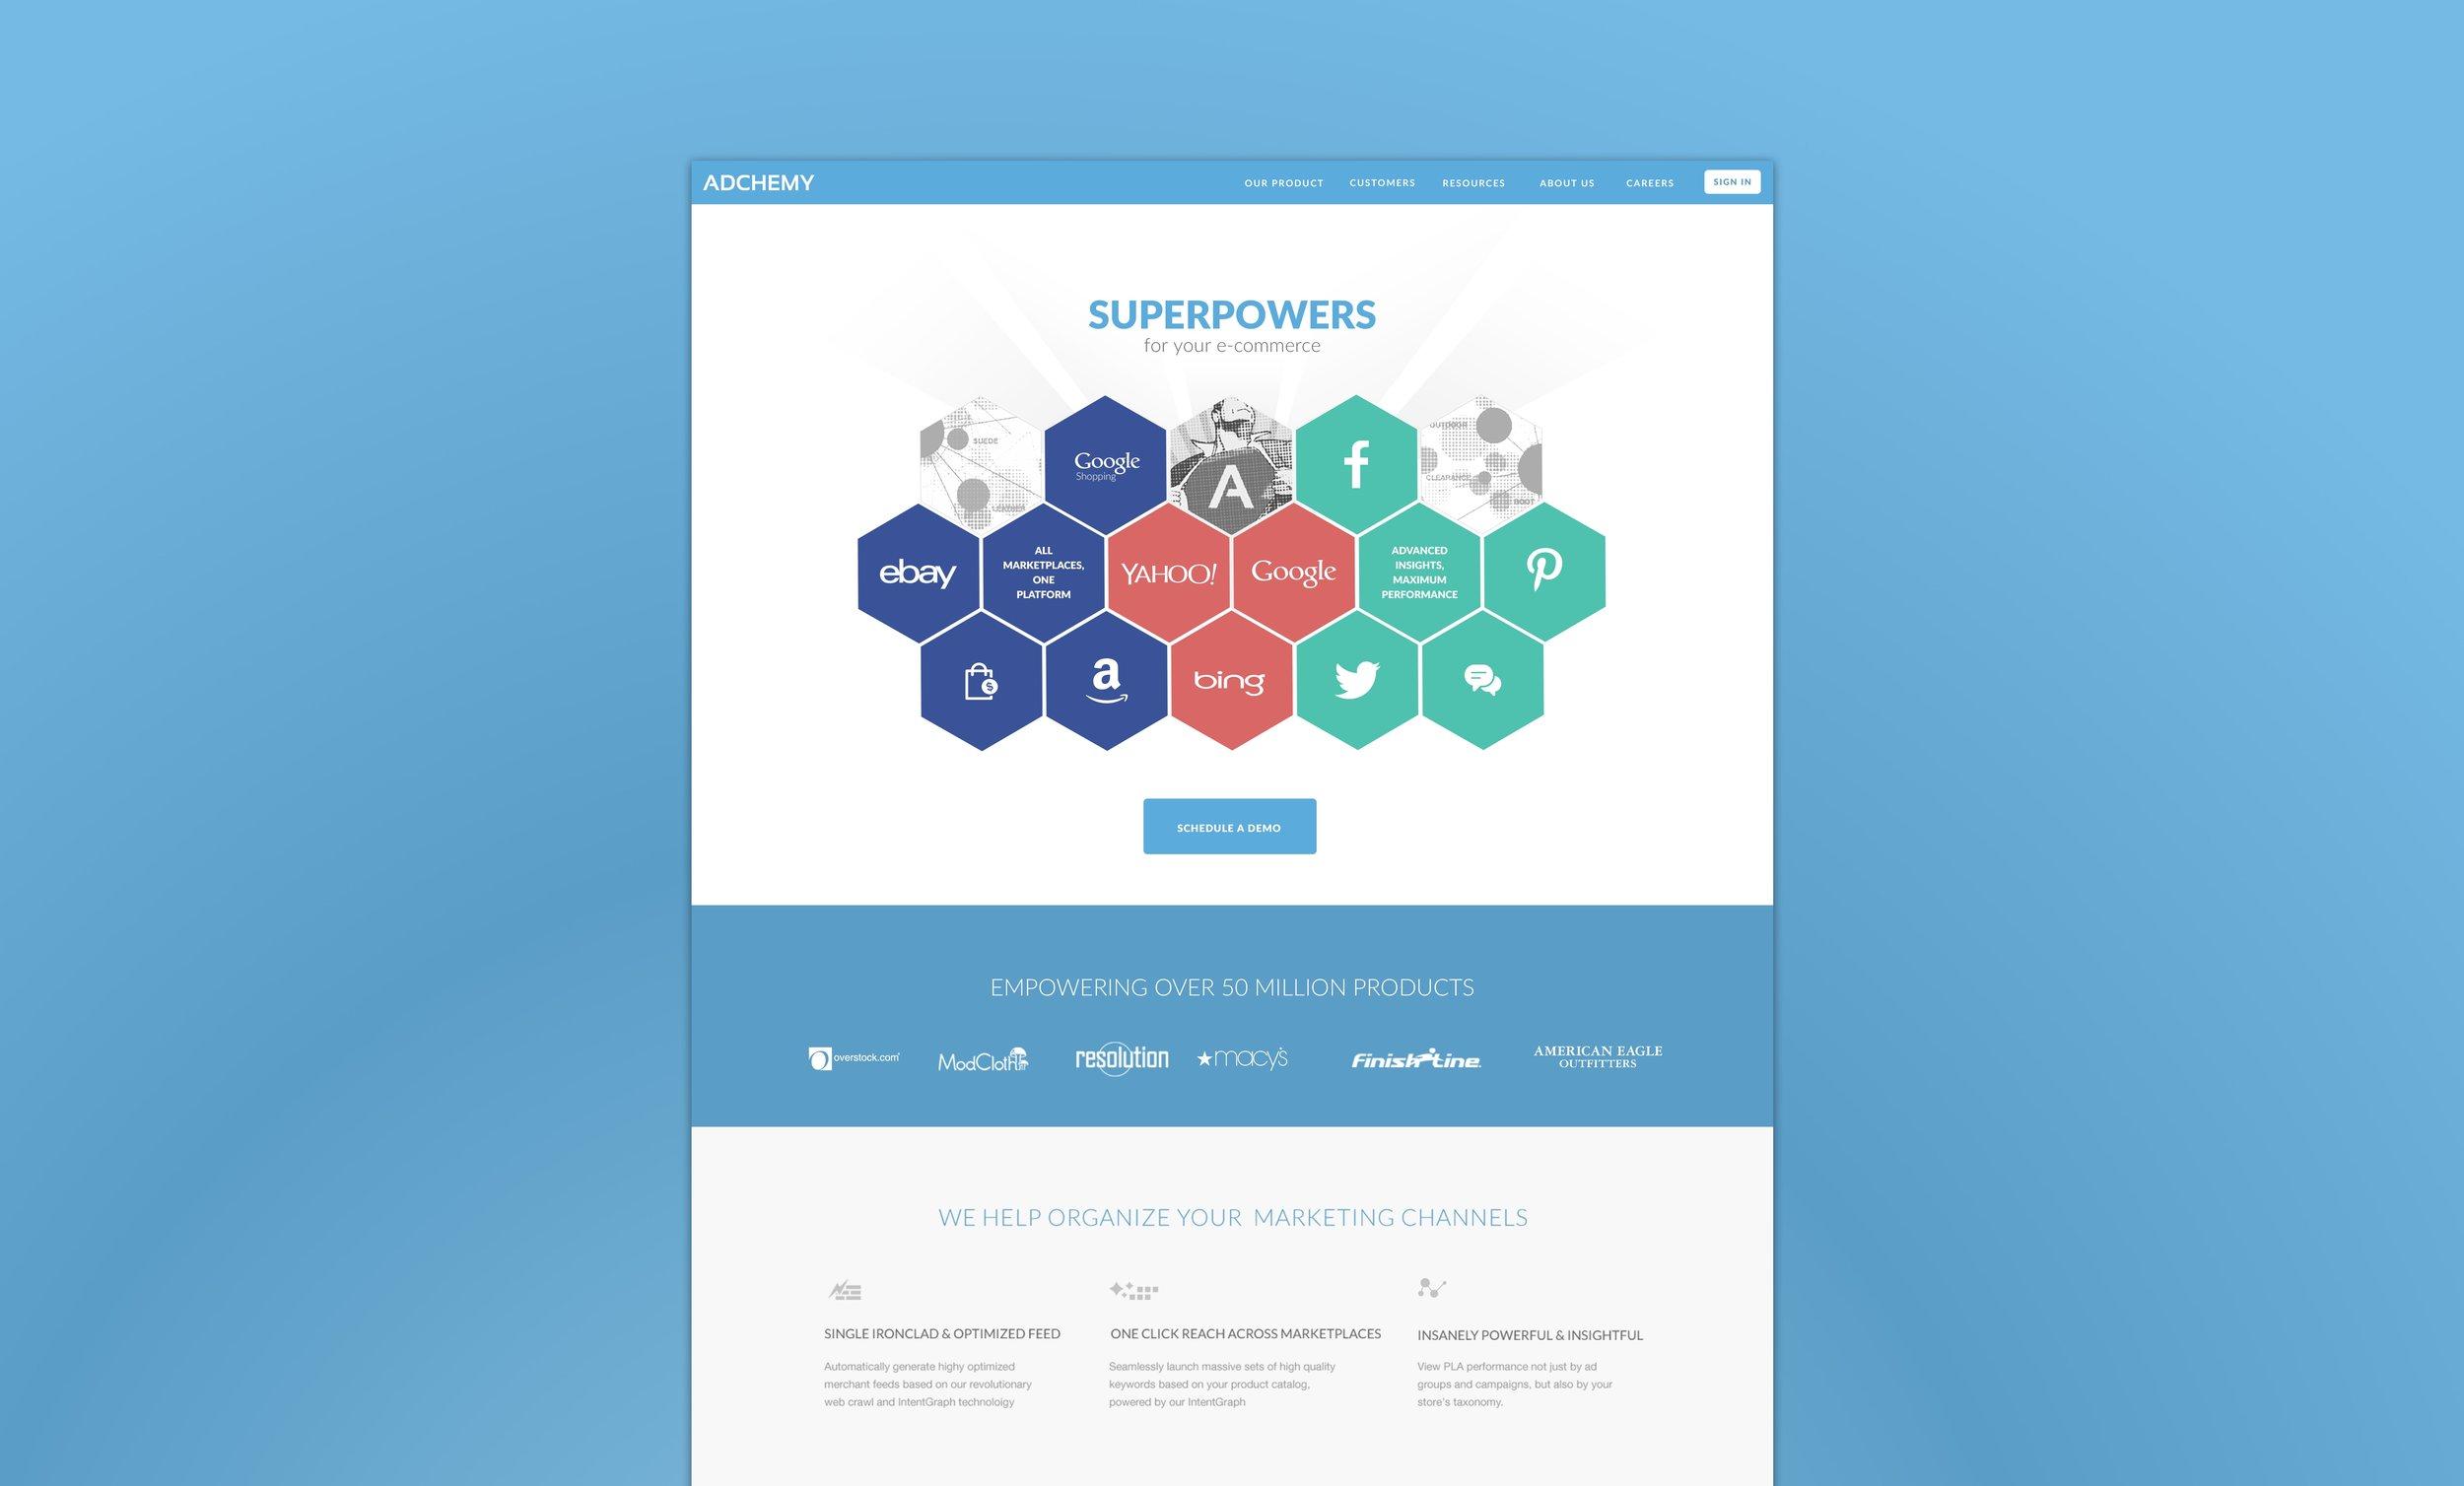 adchemy-web-desktop.jpg